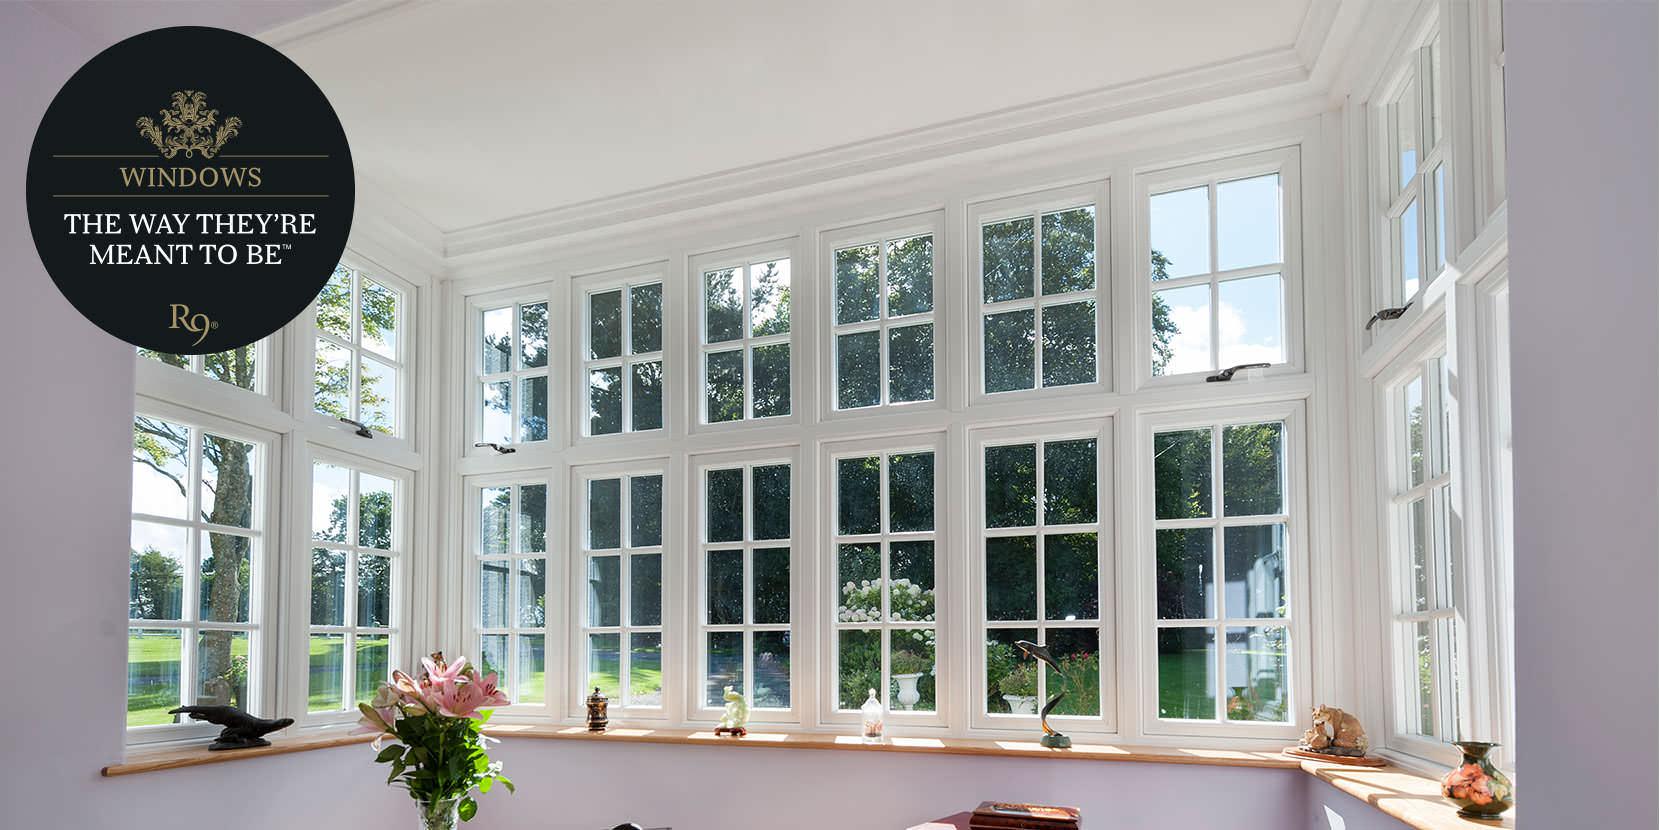 residence-9-bay-windows Allestree